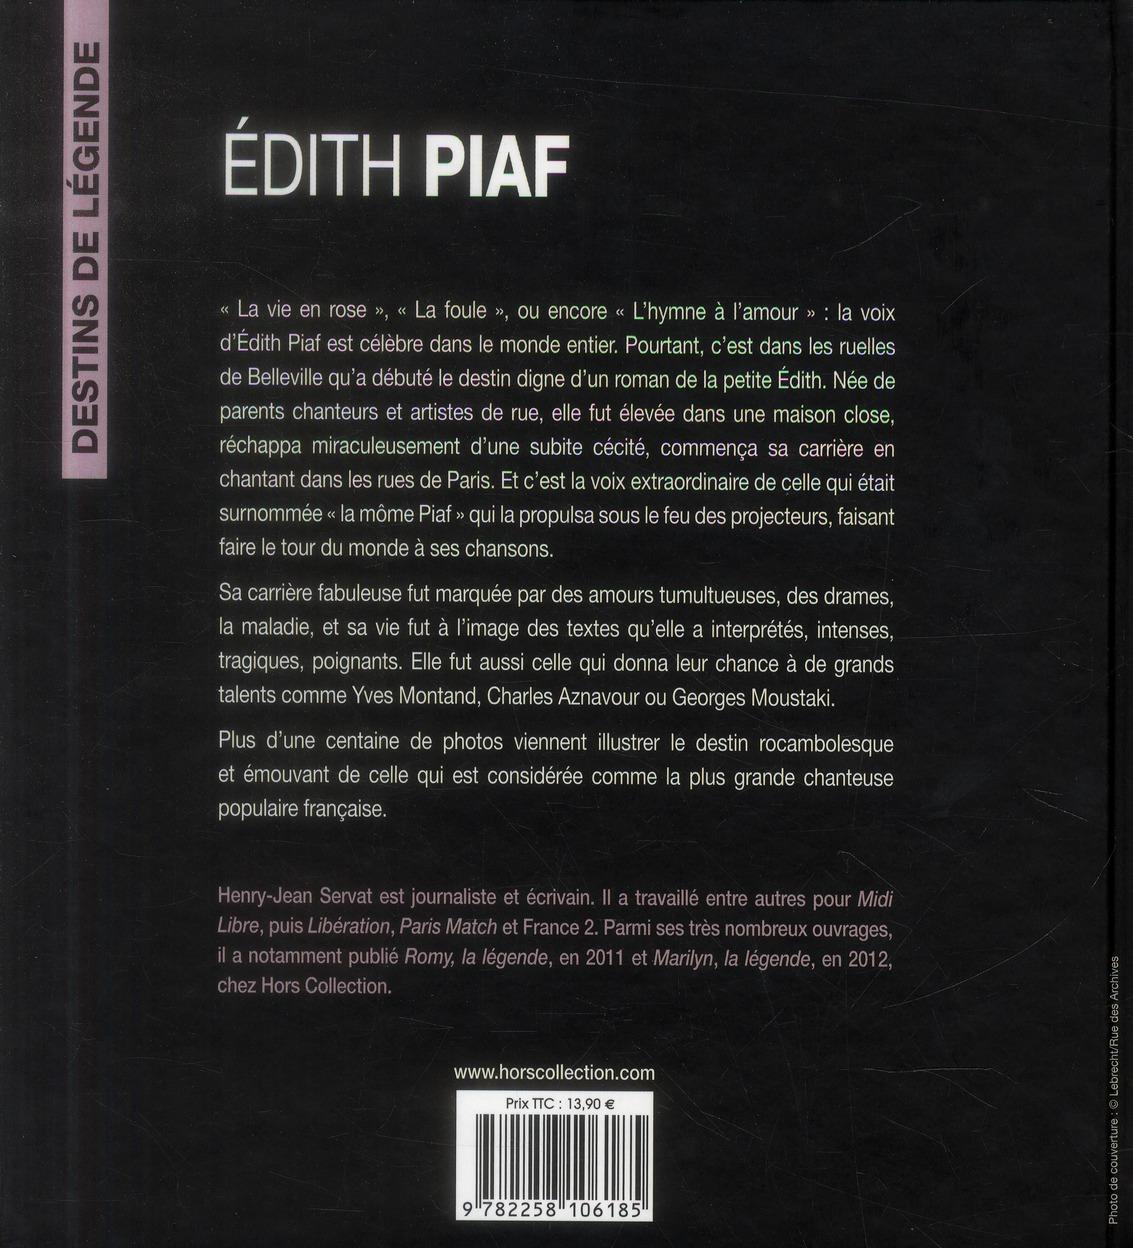 Edith Piaf ; destins de légende